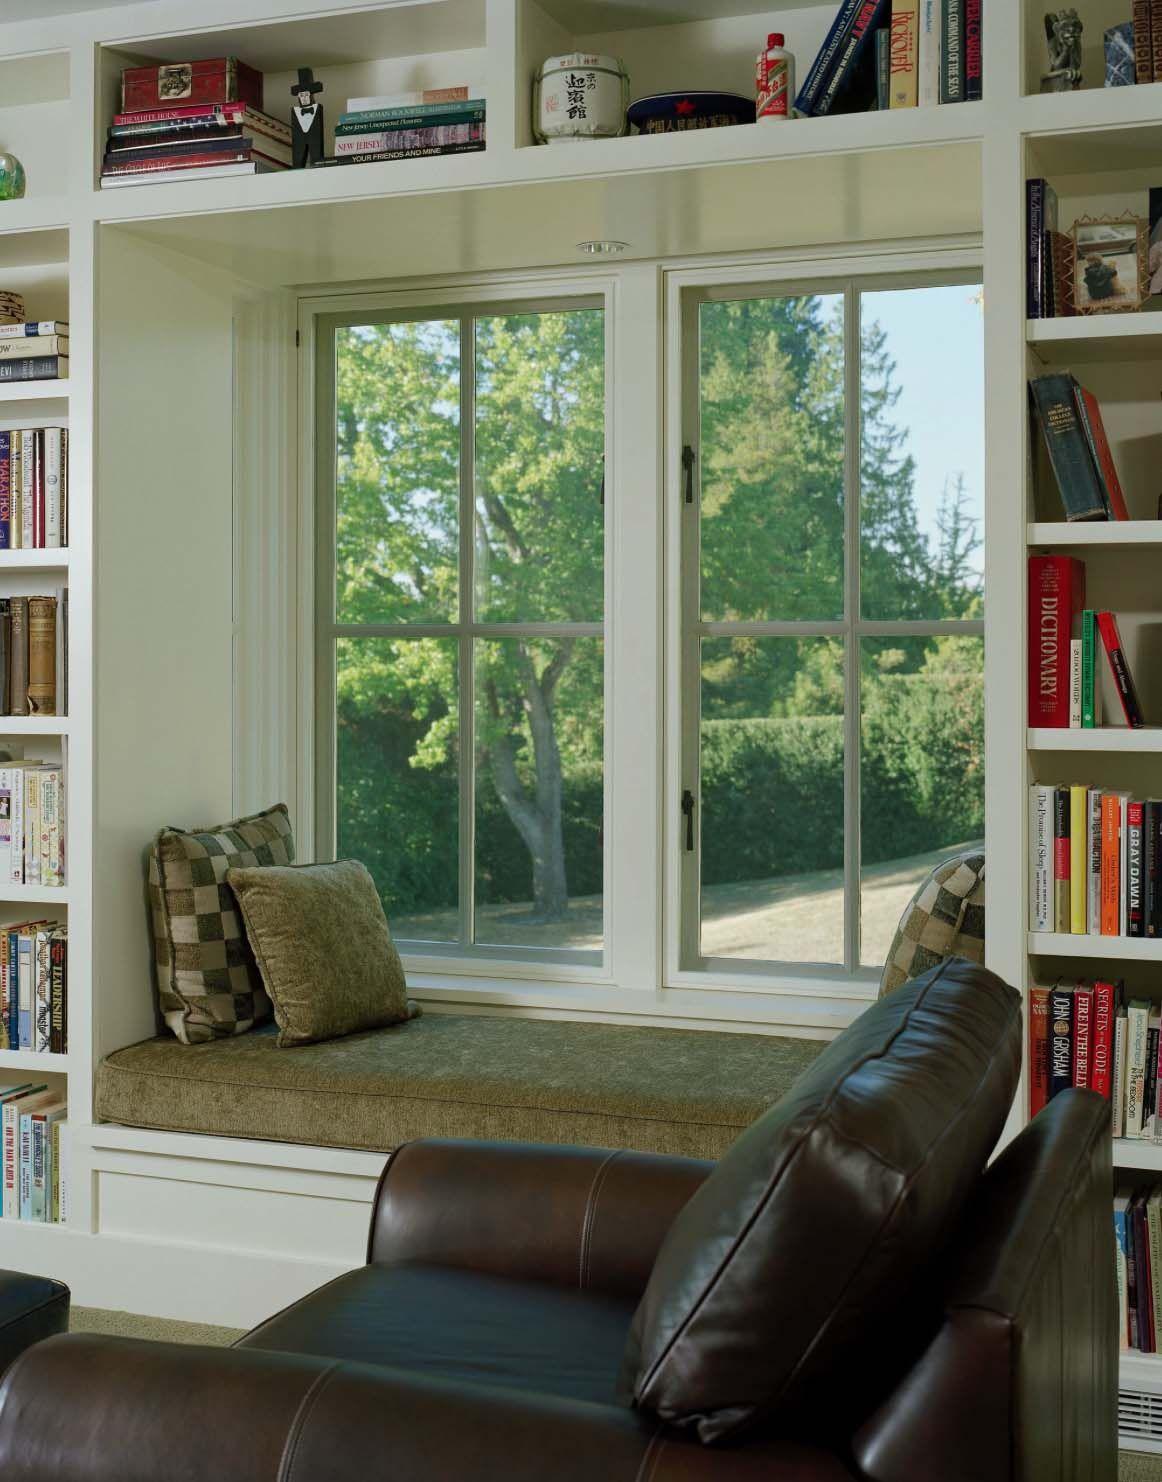 Window seat ideas living room  homelibrarywithwindowseatkindesigng   built